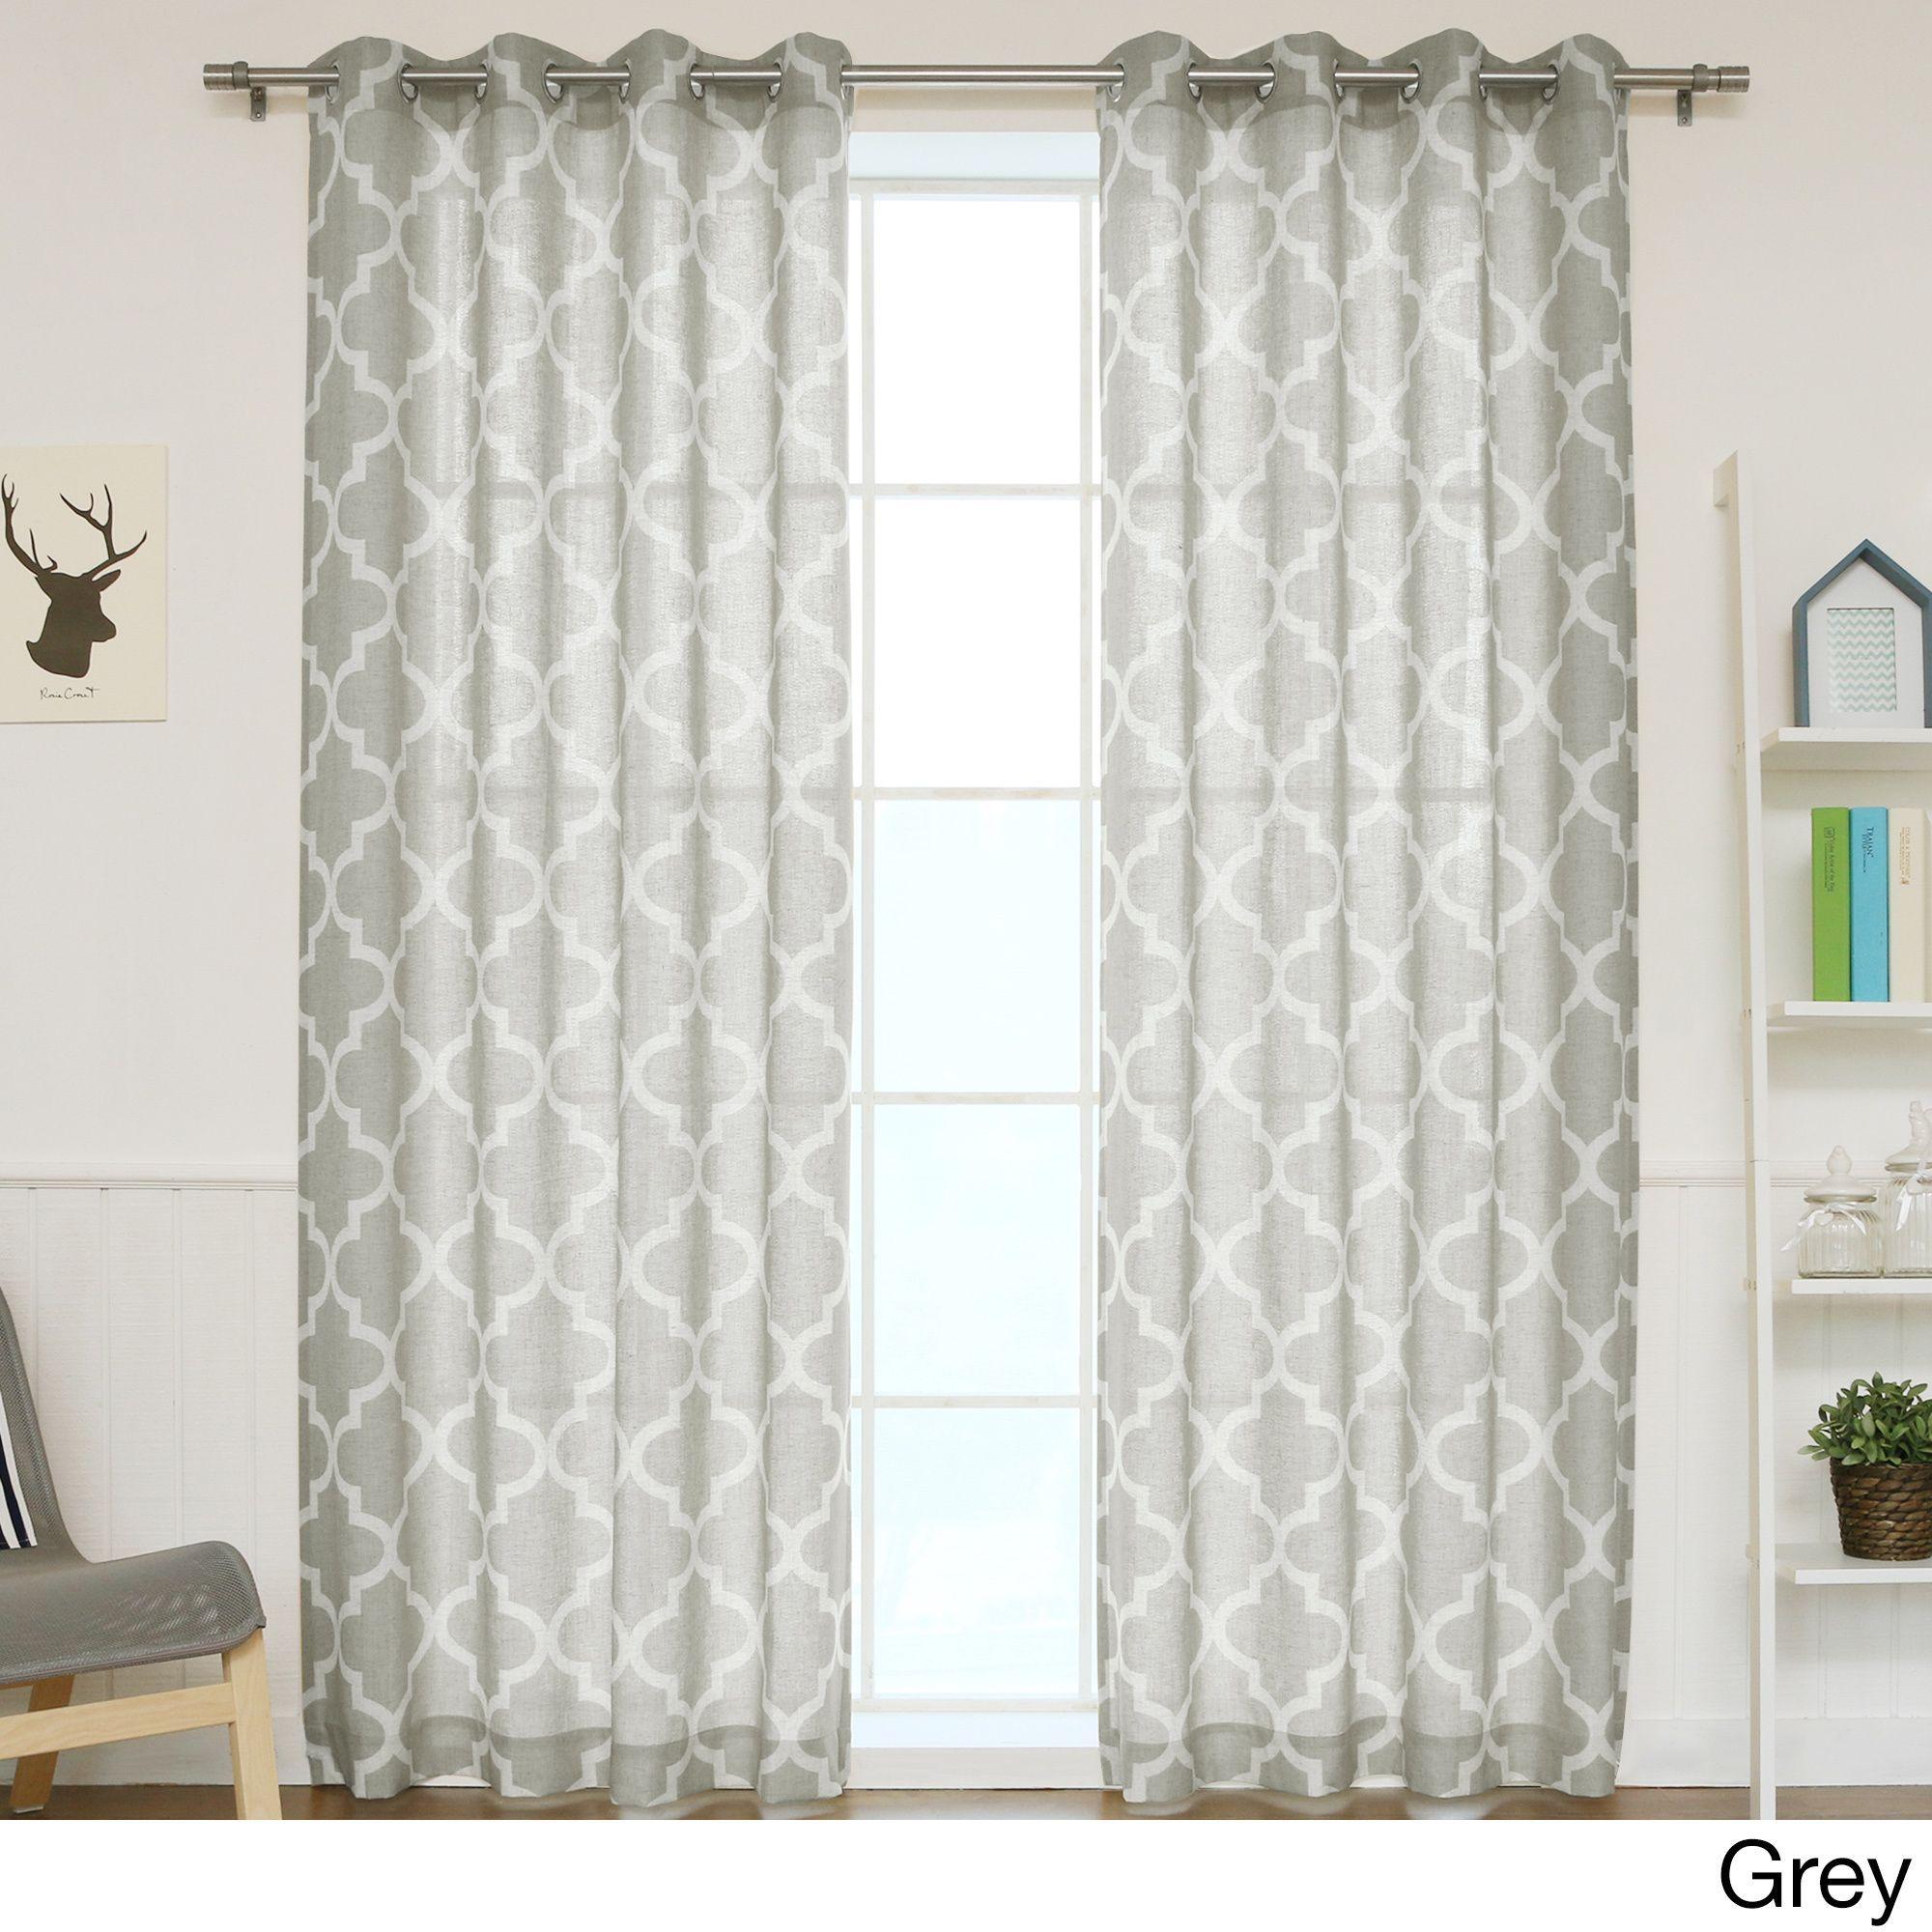 Aurora home moroccan print flax linen blend grommet top curtain